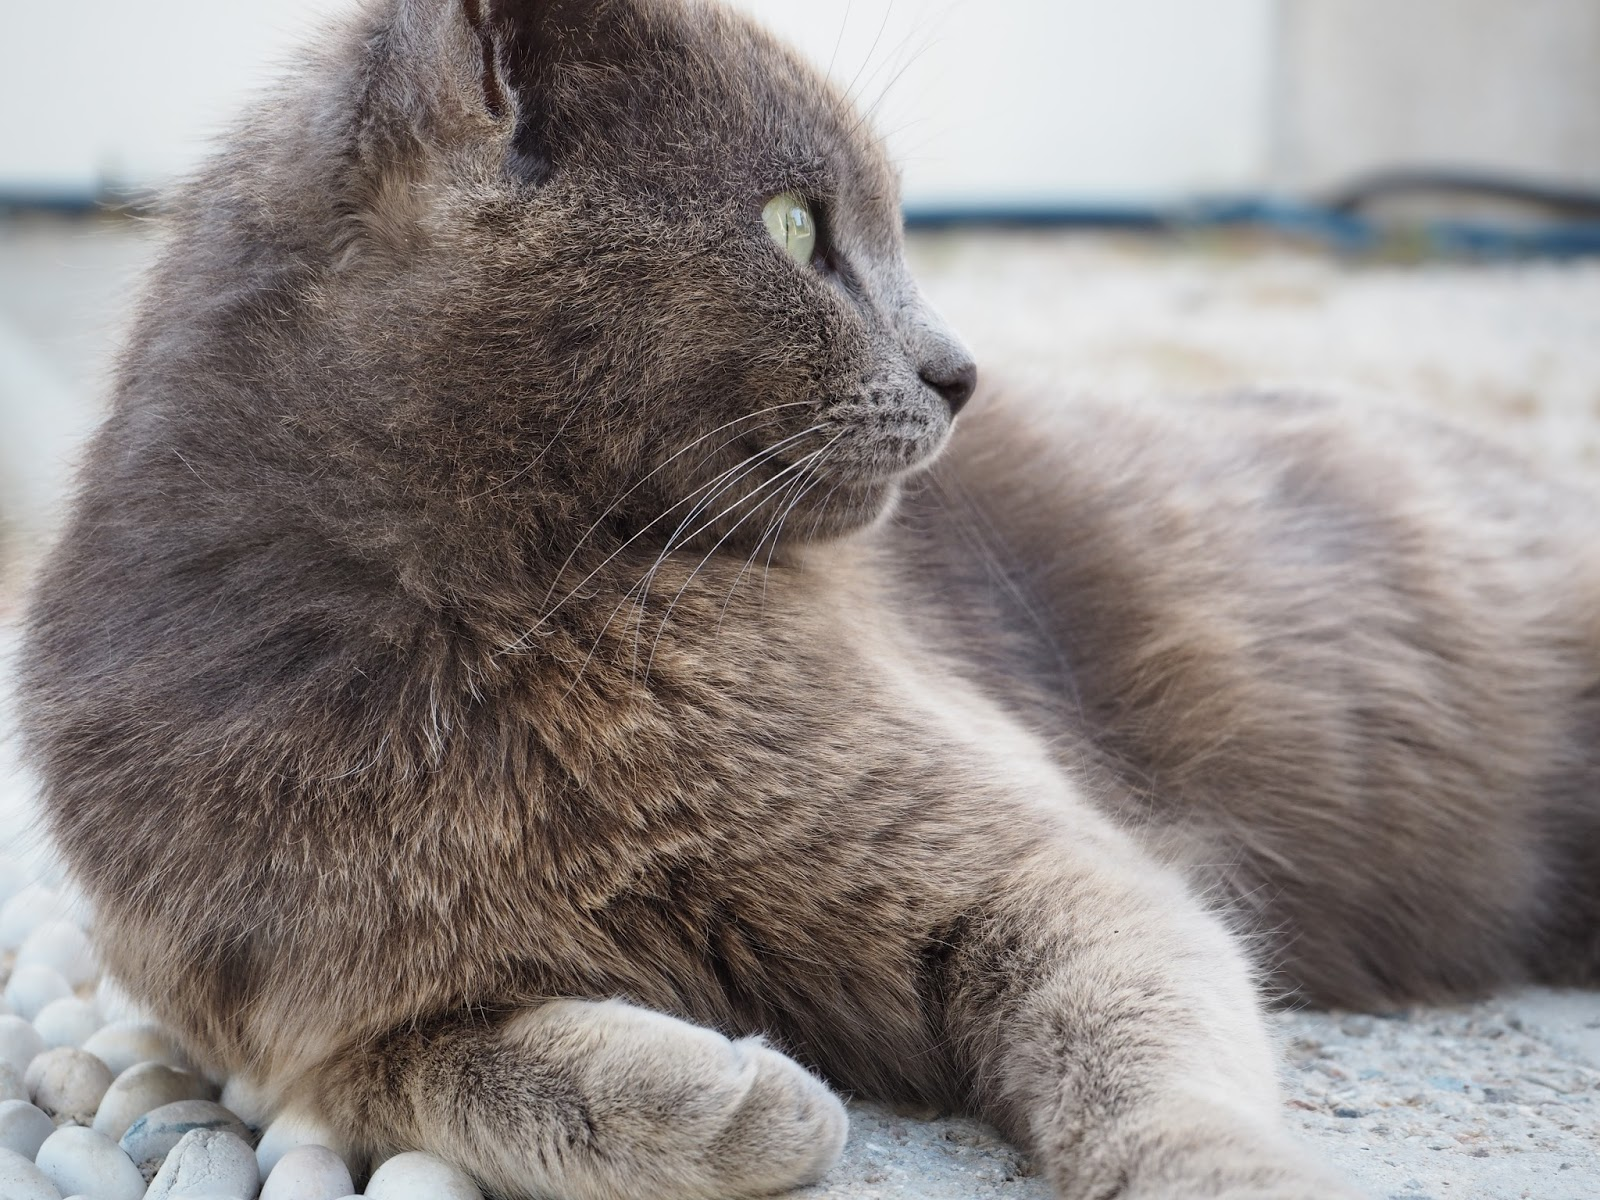 kissa rodoksella